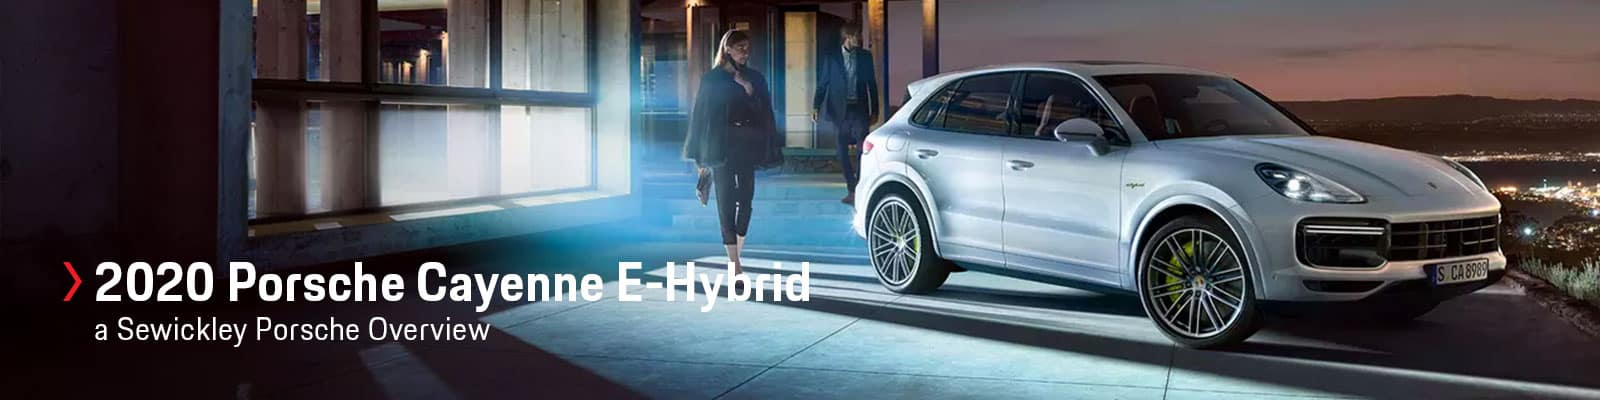 2020 Porsche Cayenne E-Hybrid Model Review